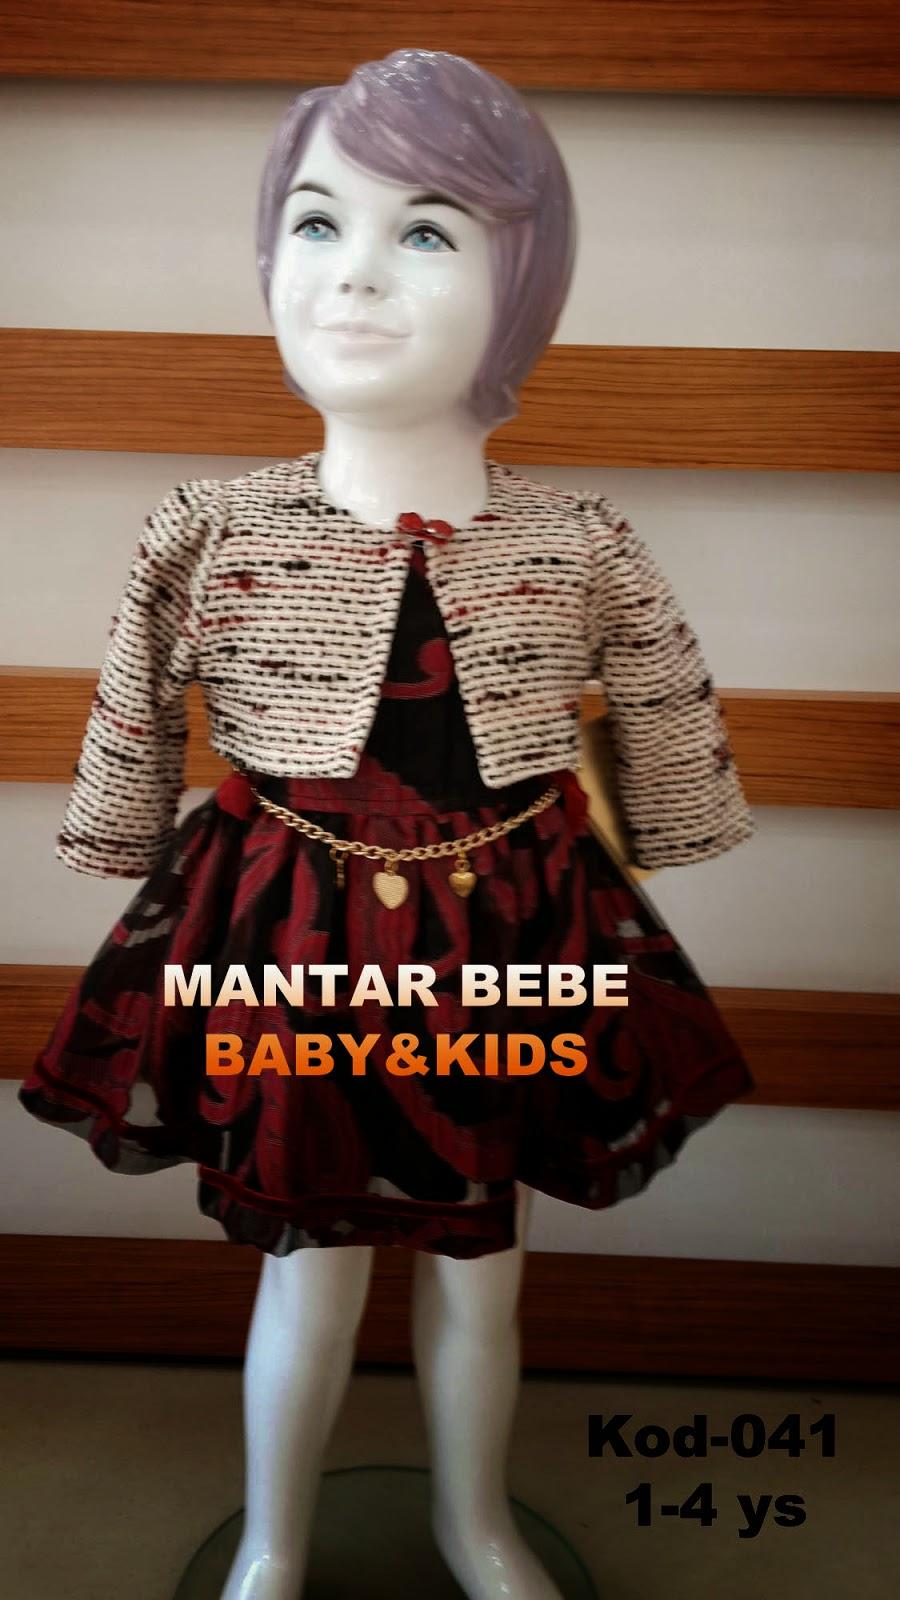 MANTAR BEBE ÇOCUK GİYİM - KOD041